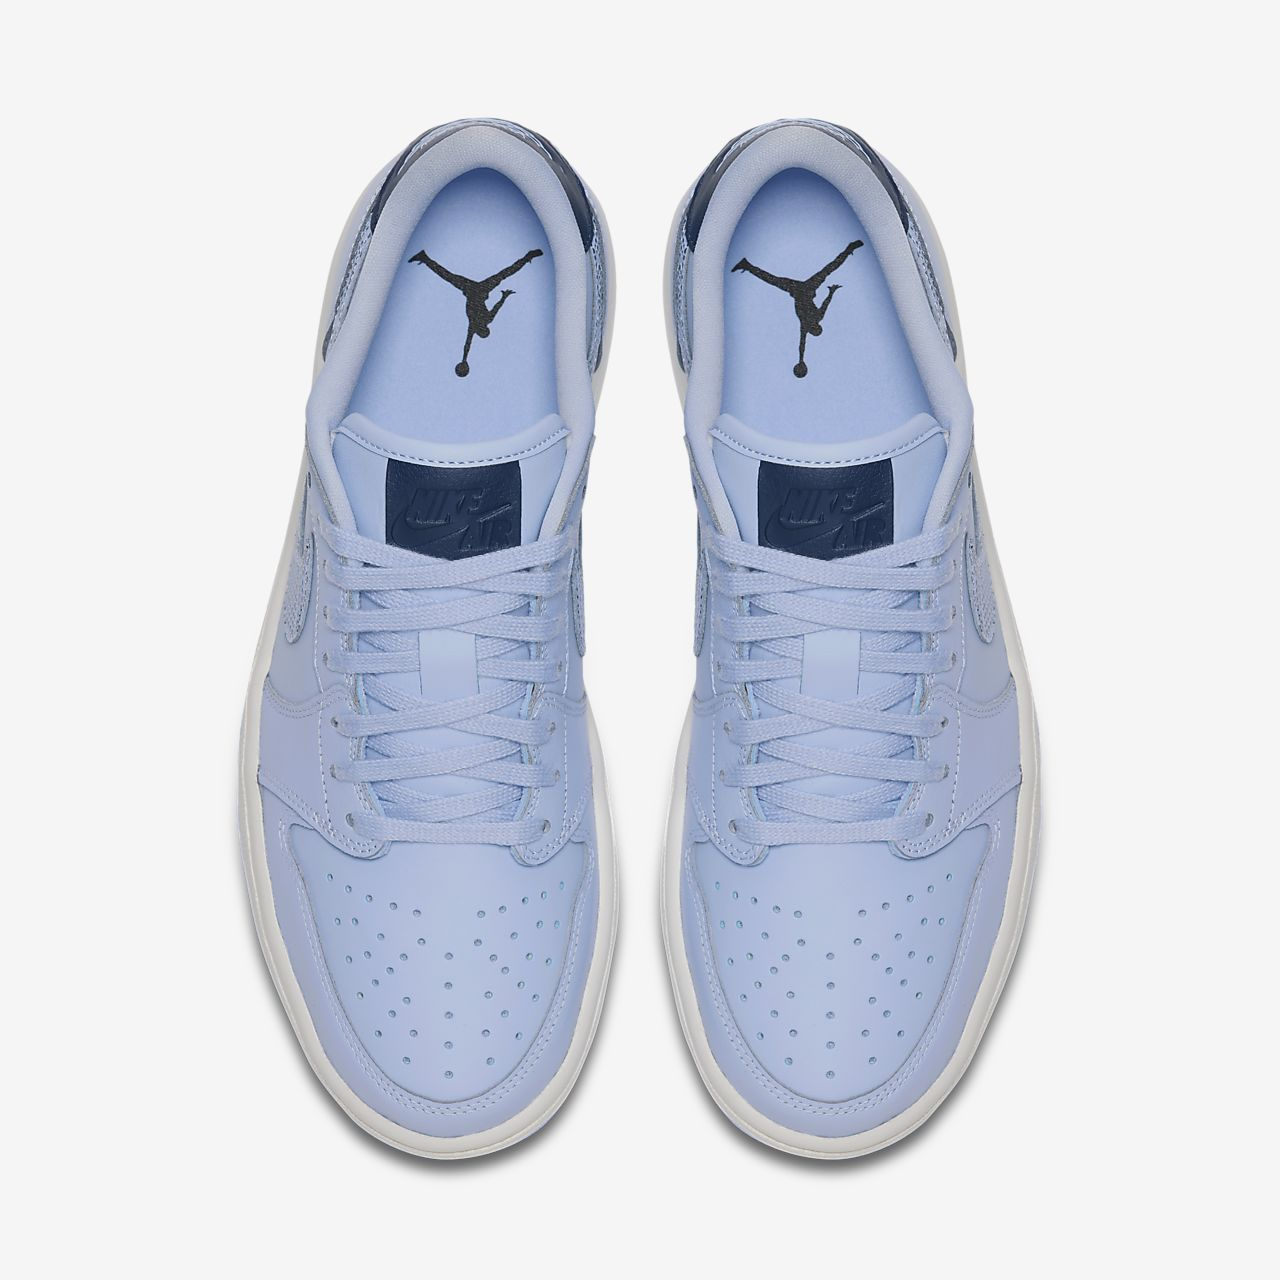 pretty nice f7c22 5f489 Air Jordan 1 Retro Low OG-sko til kvinder. Nike.com DK